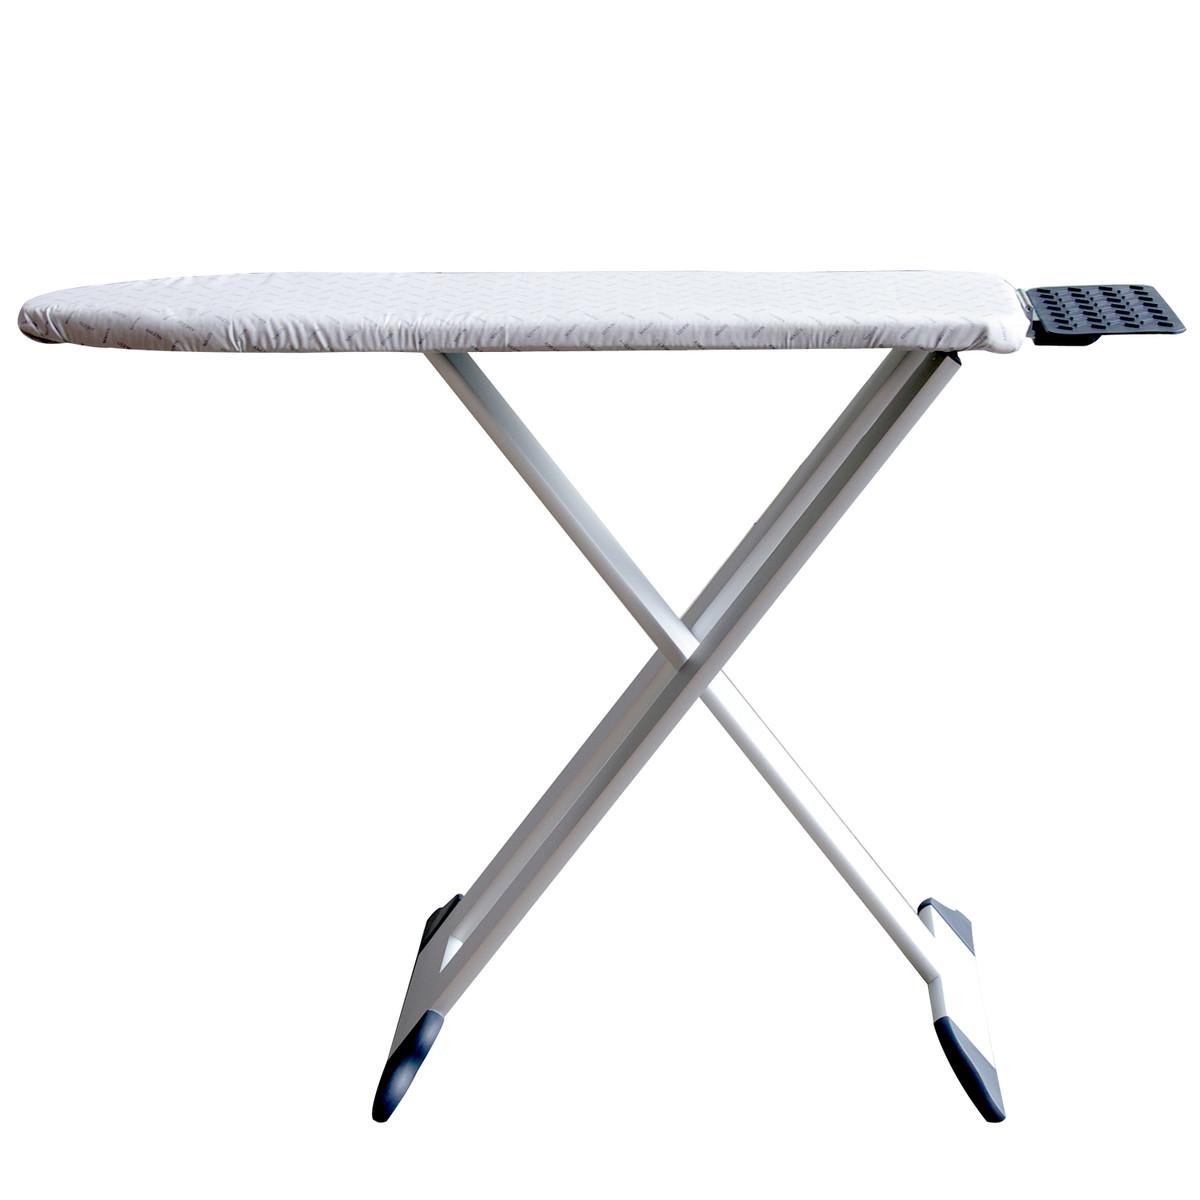 Magis amleto ironing board design group italia owo for Magis design